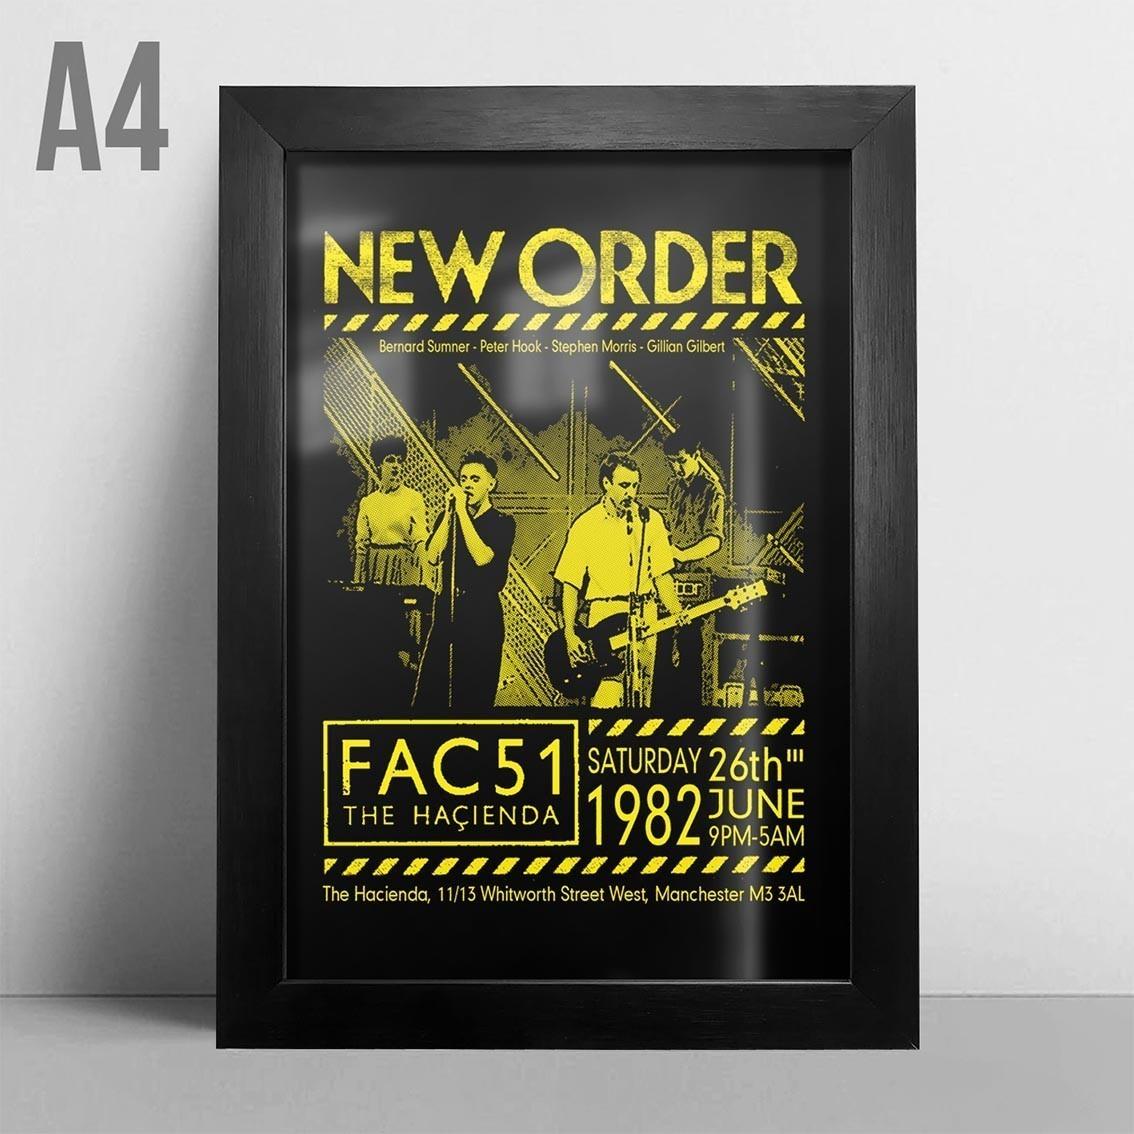 Quadro A4 - New Order